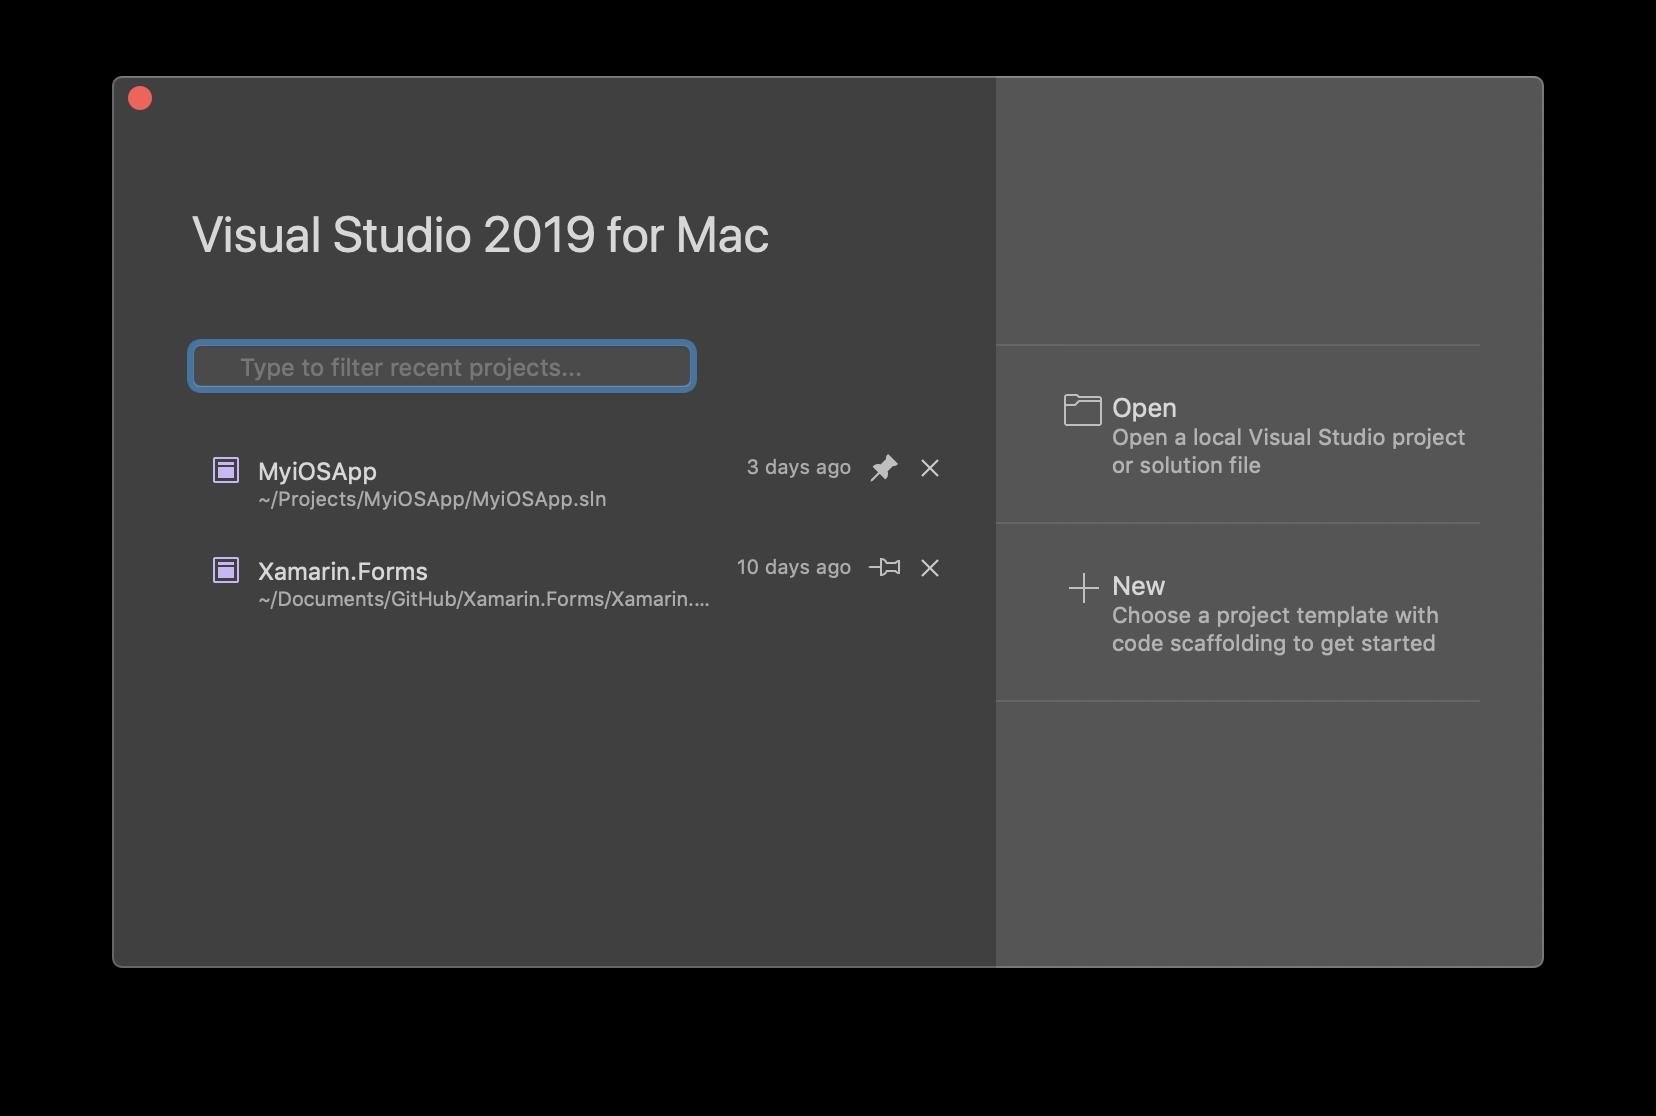 Visual Studio 2019 for Mac – Release Notes | Microsoft Docs